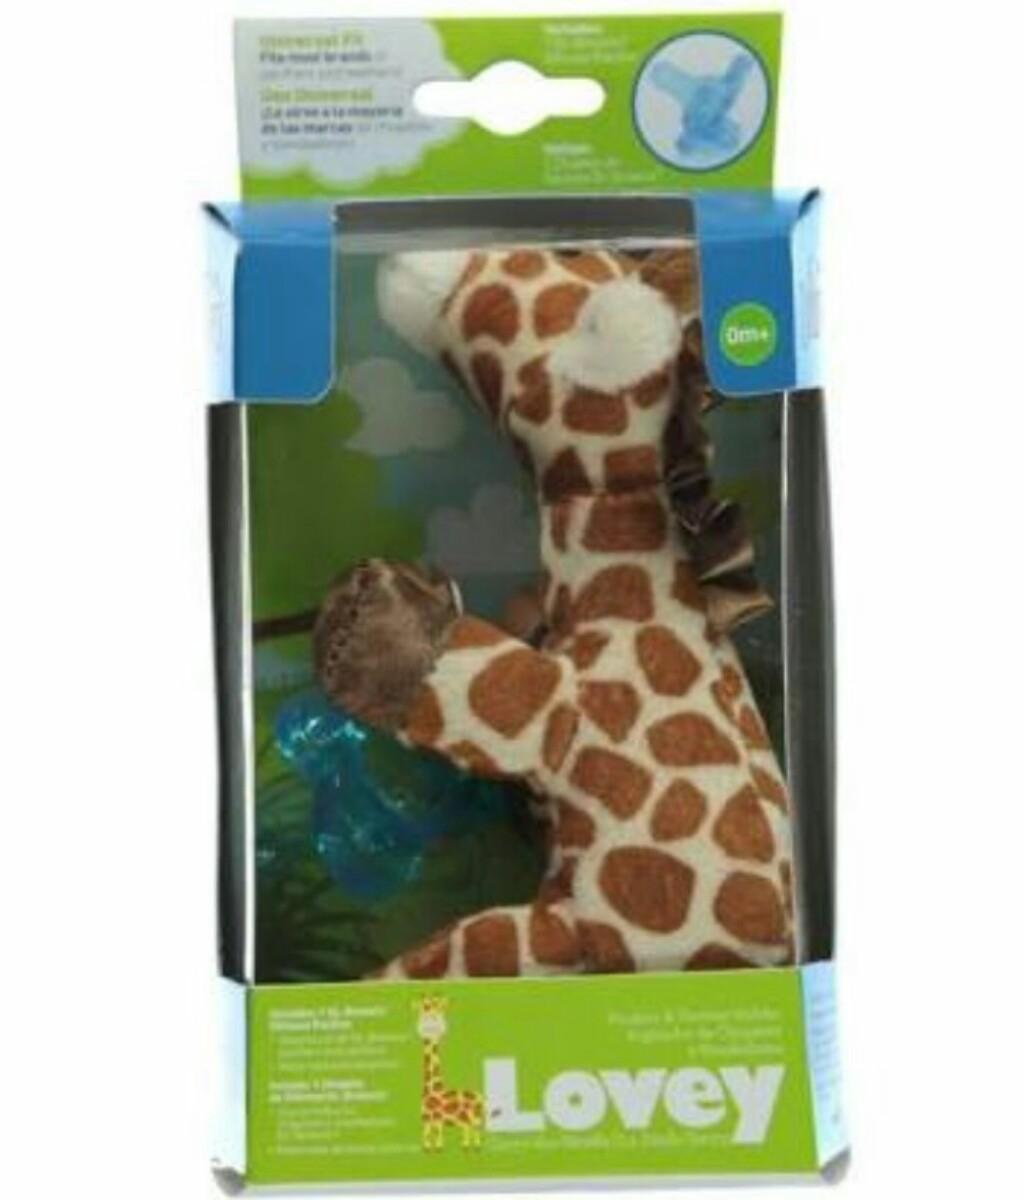 Chupeta Lovey Dr. Brown Original Com Pelucia Girafa